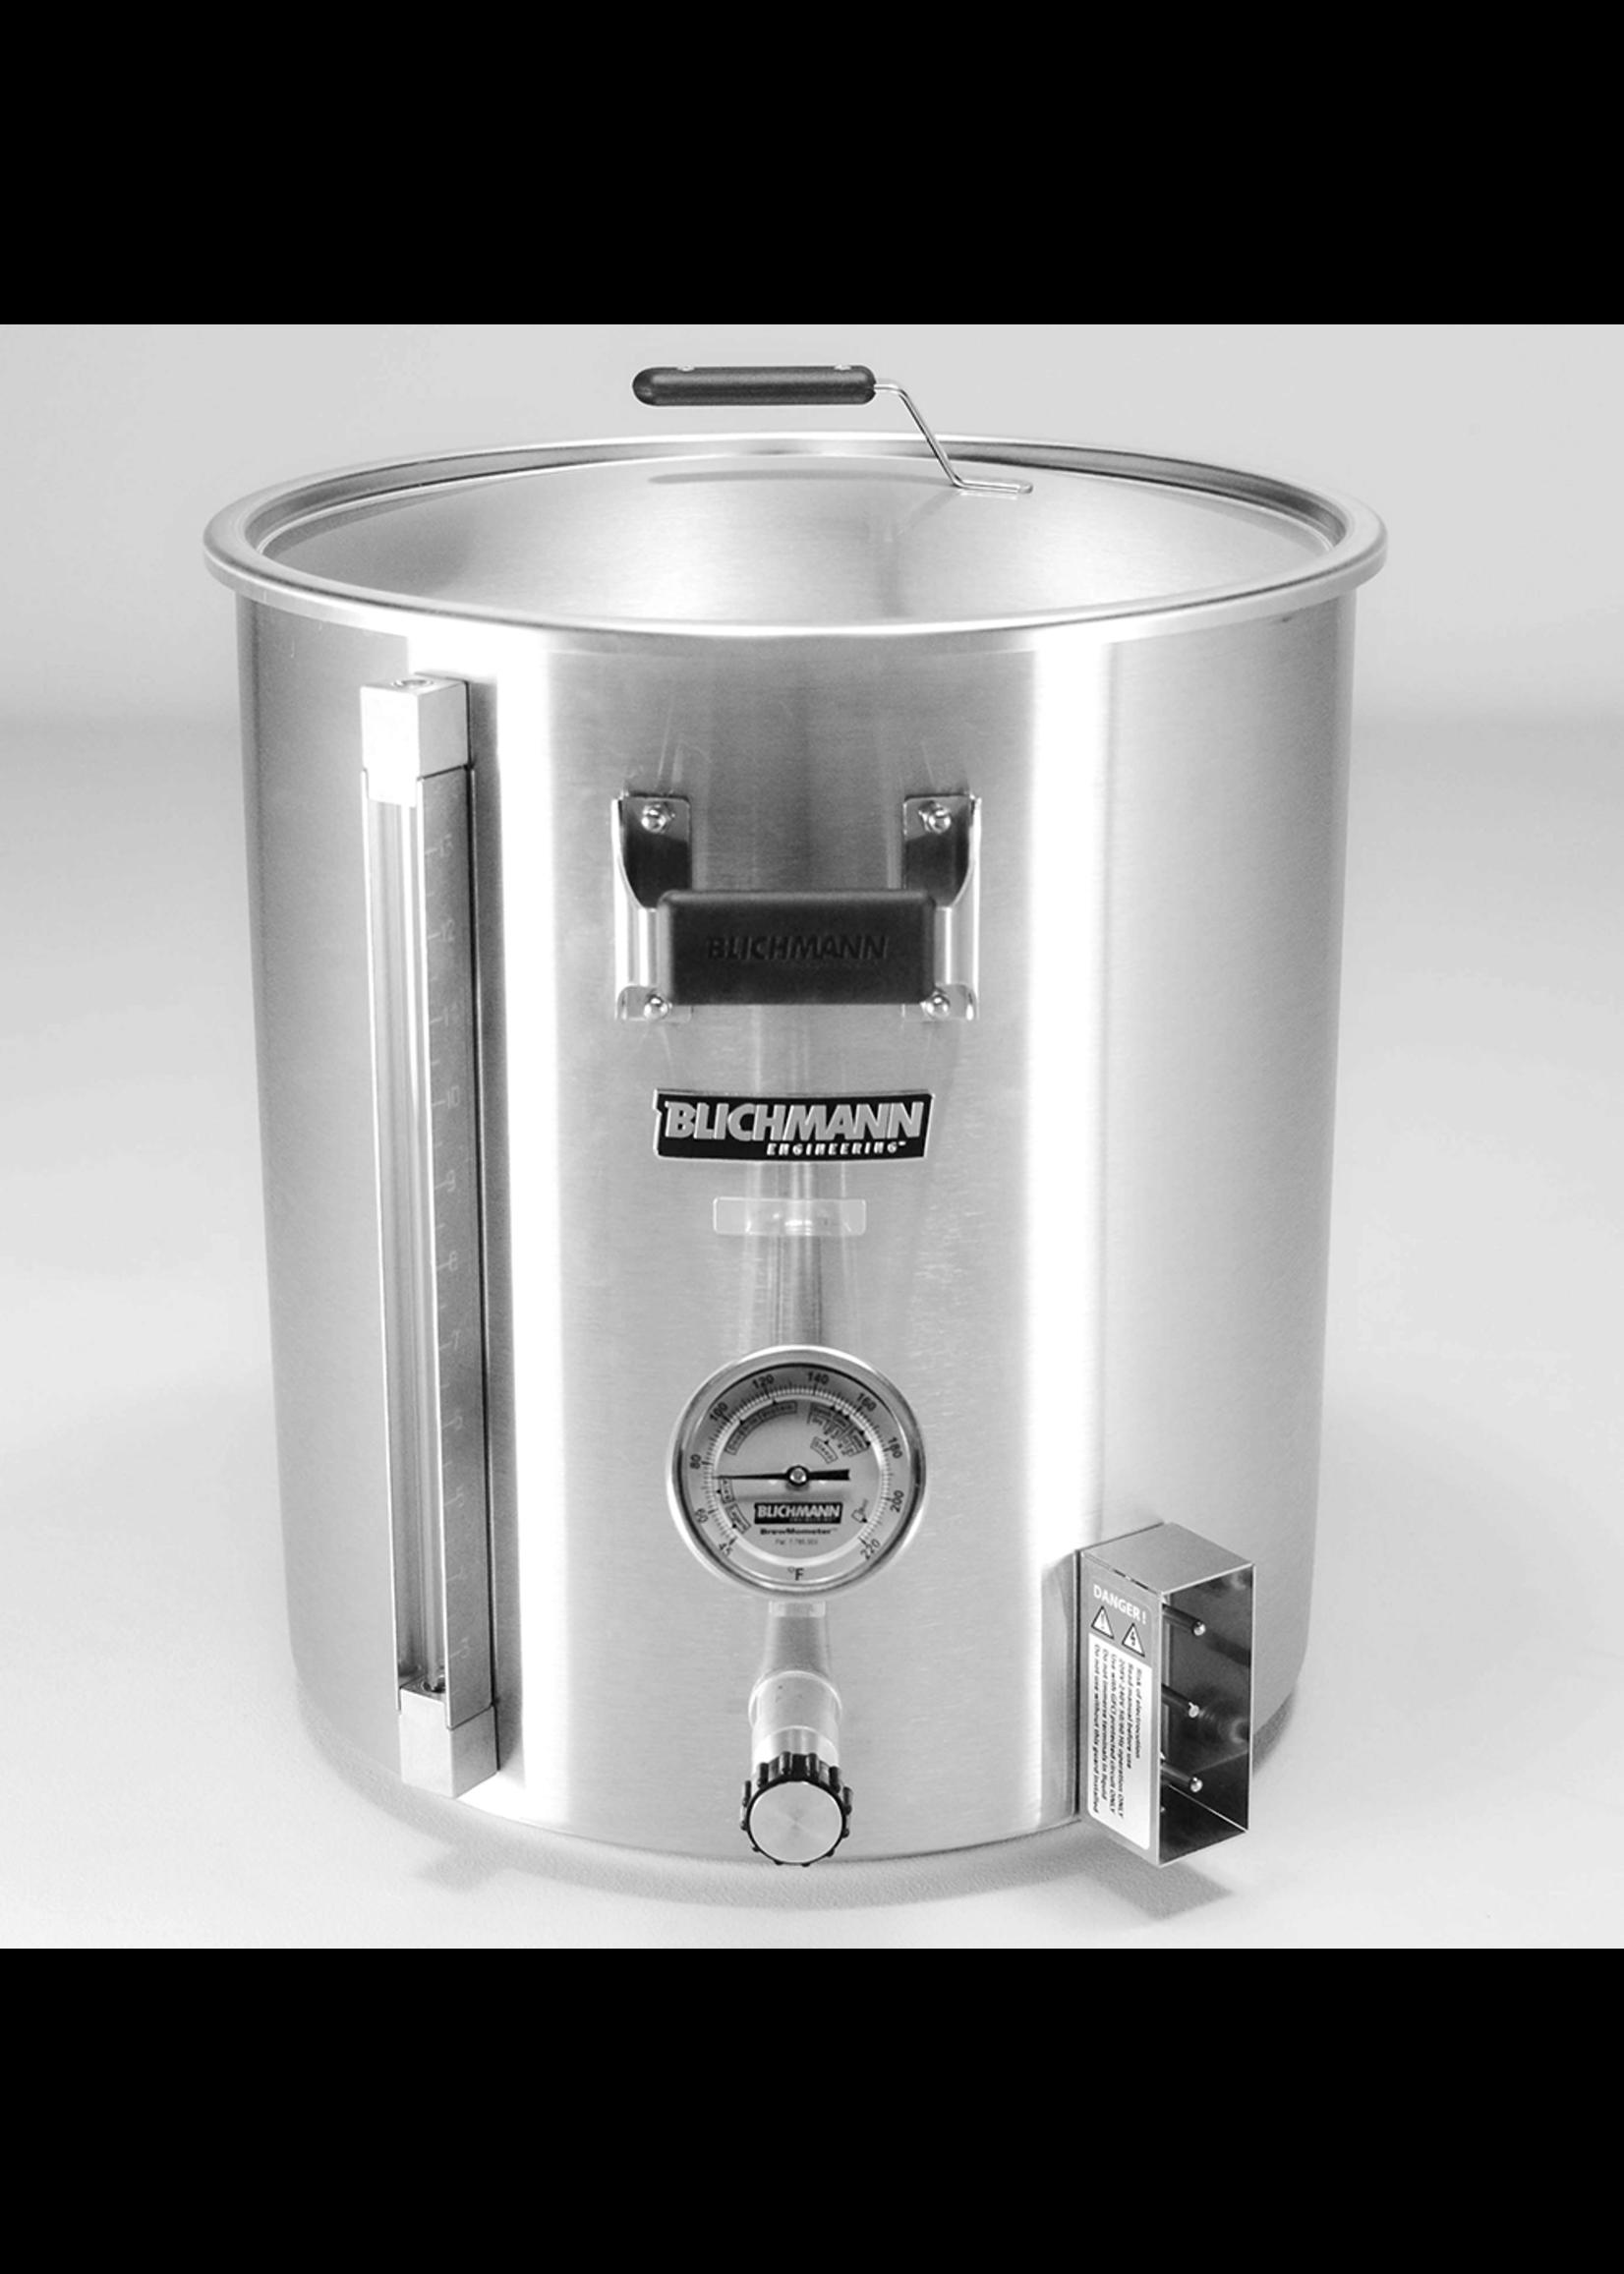 Blichmann Blichmann BoilerMaker G2 - 30 Gallon 240V Electric Brew Kettle (Celsius)